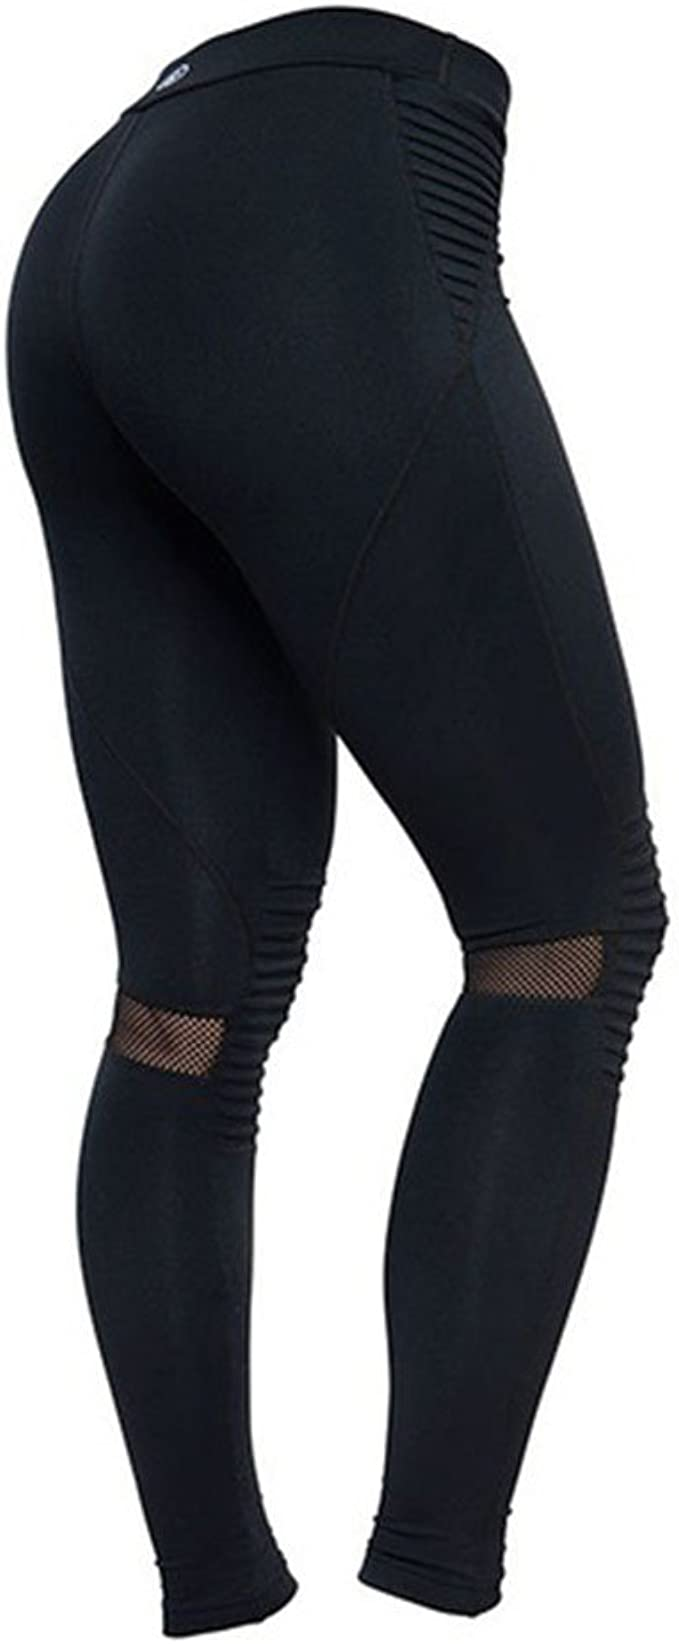 Damen Jogginghose Gym Leggings Fitness Leggins Jogging Trainingshose Sporthose